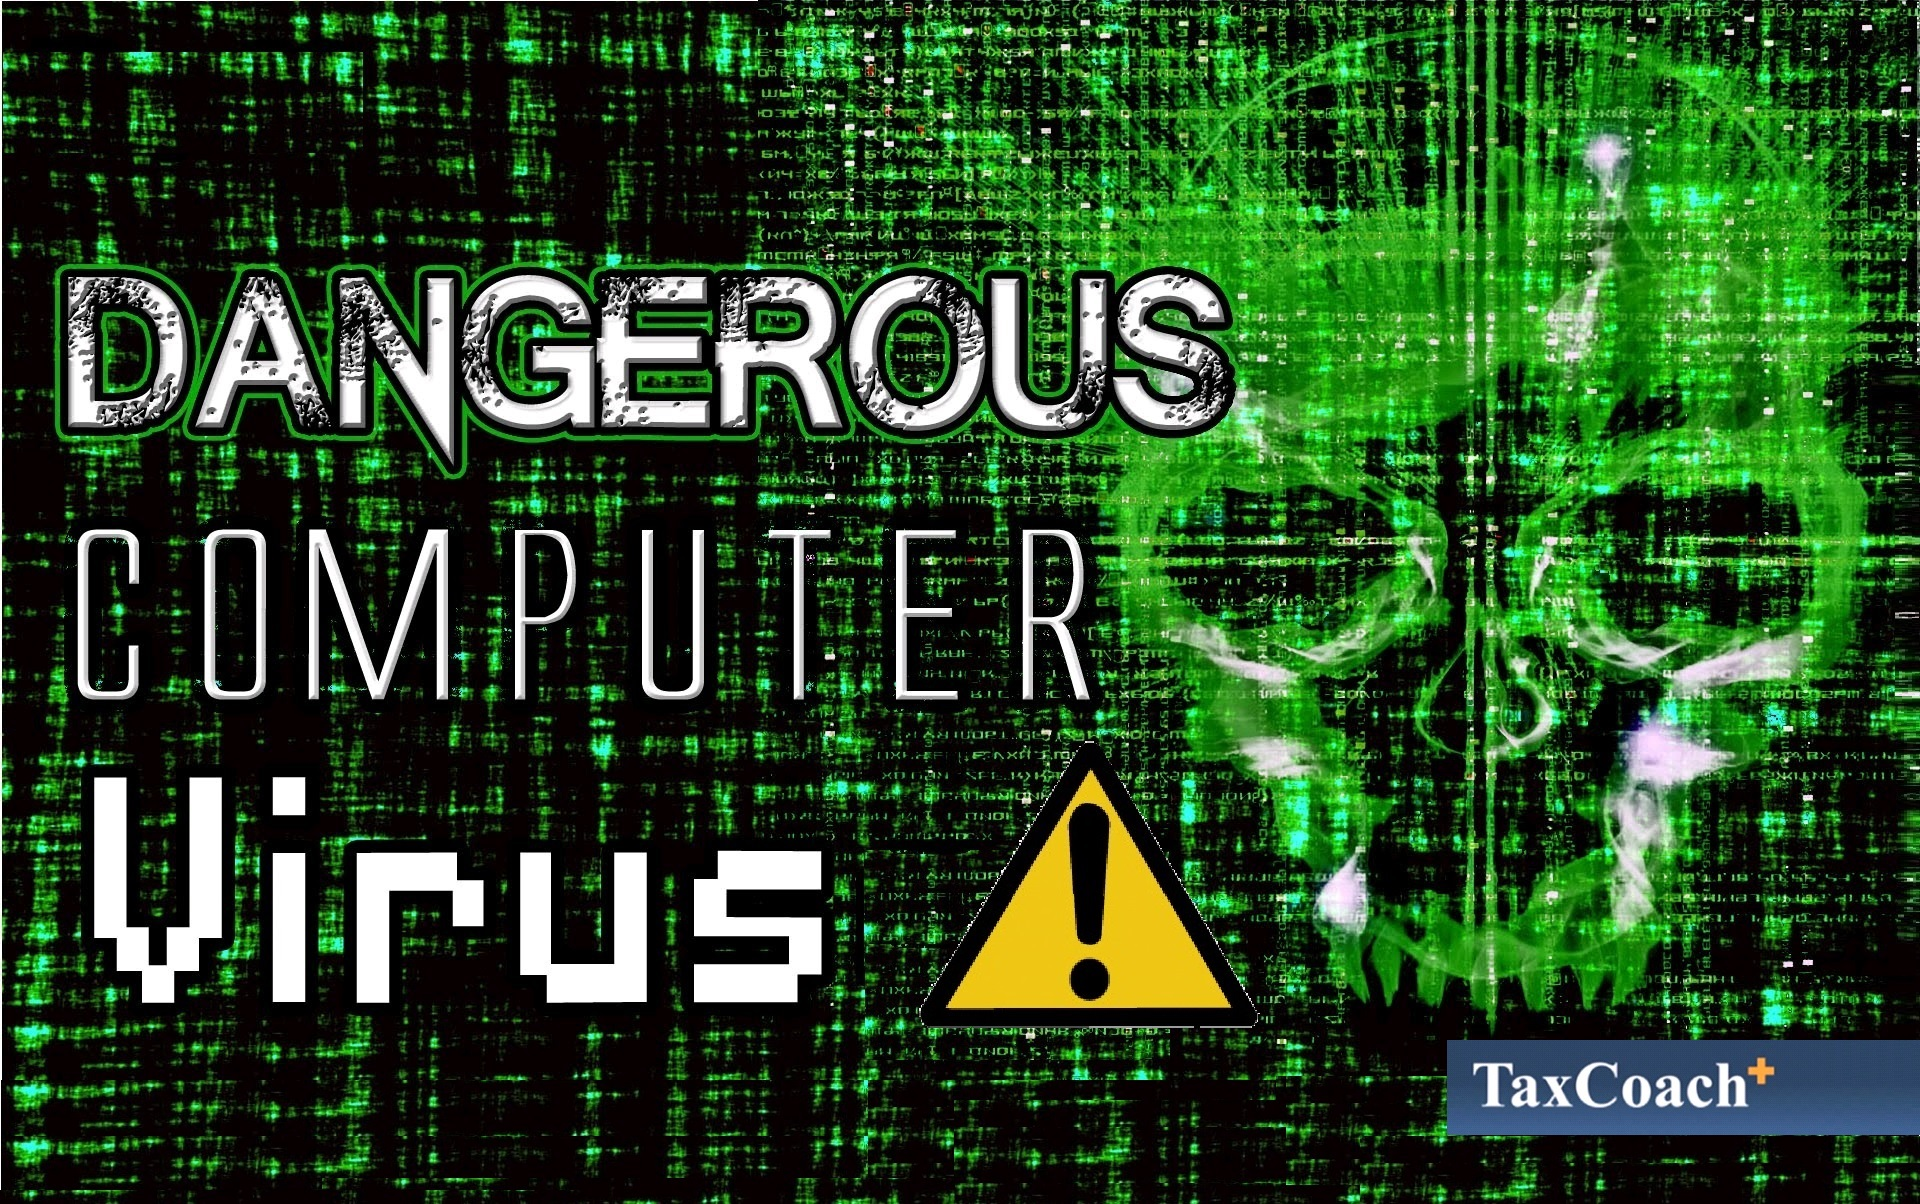 Alert! Ιδιαιτέρως επικίνδυνο λογισμικό που προσβάλλει φορητές συσκευές